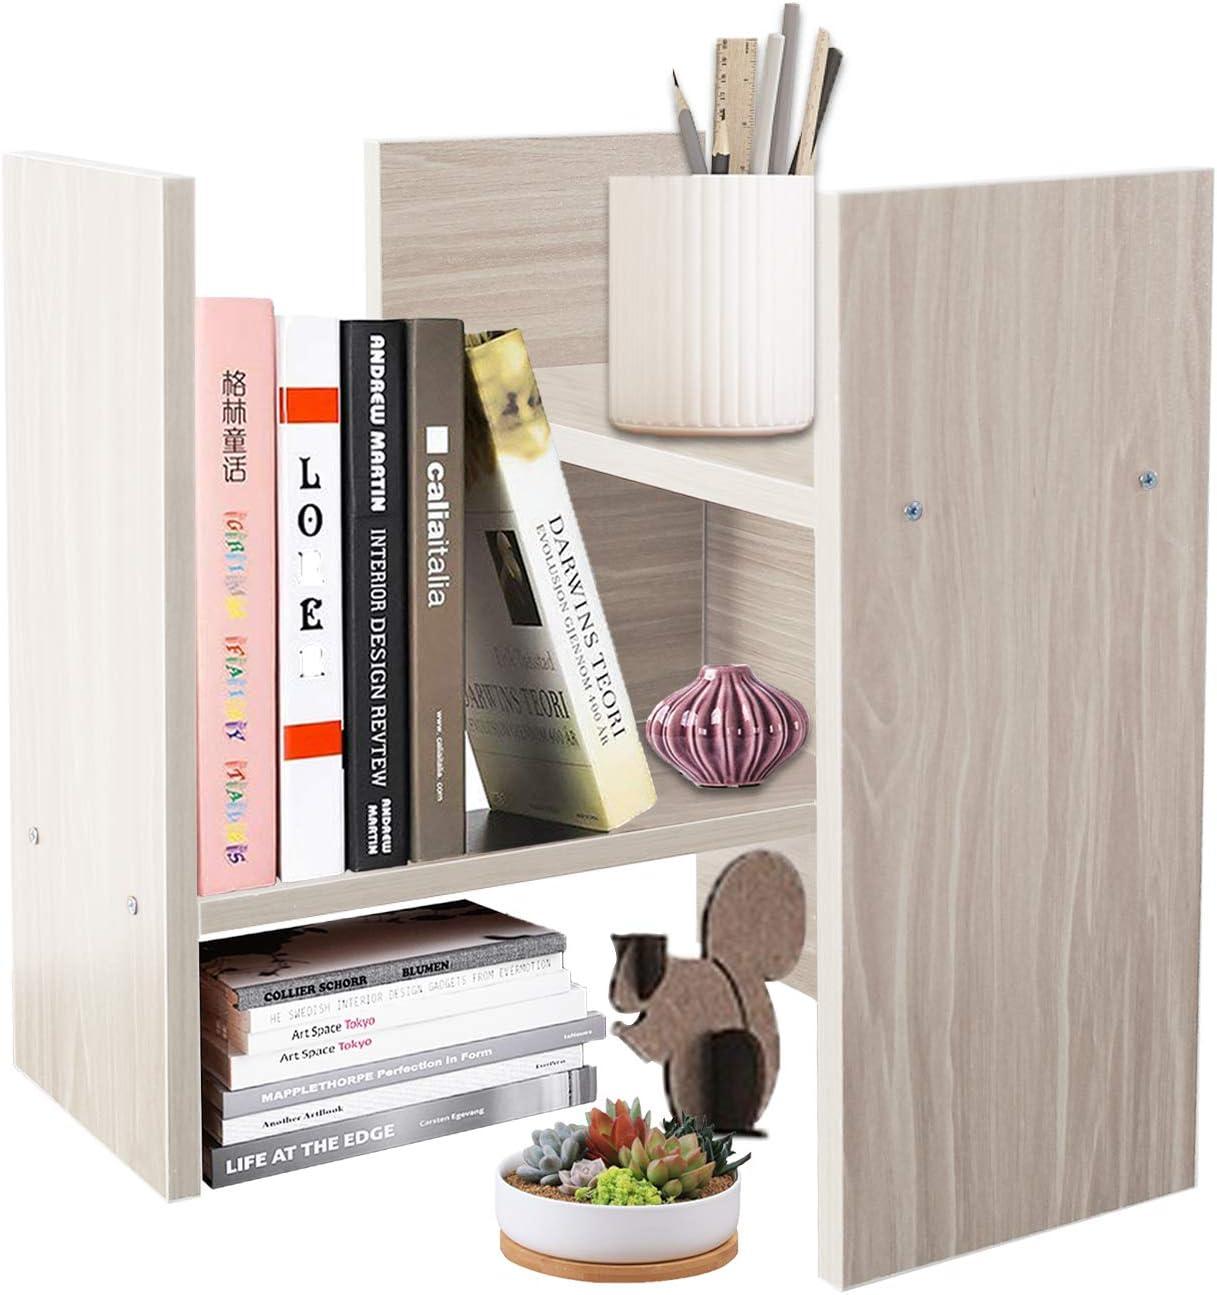 DL furniture – Expandable Wood Desktop Storage Organizer Multipurpose Desk Bookshelf Display Shelf Rack Counter Top Bookcase for Office Home White